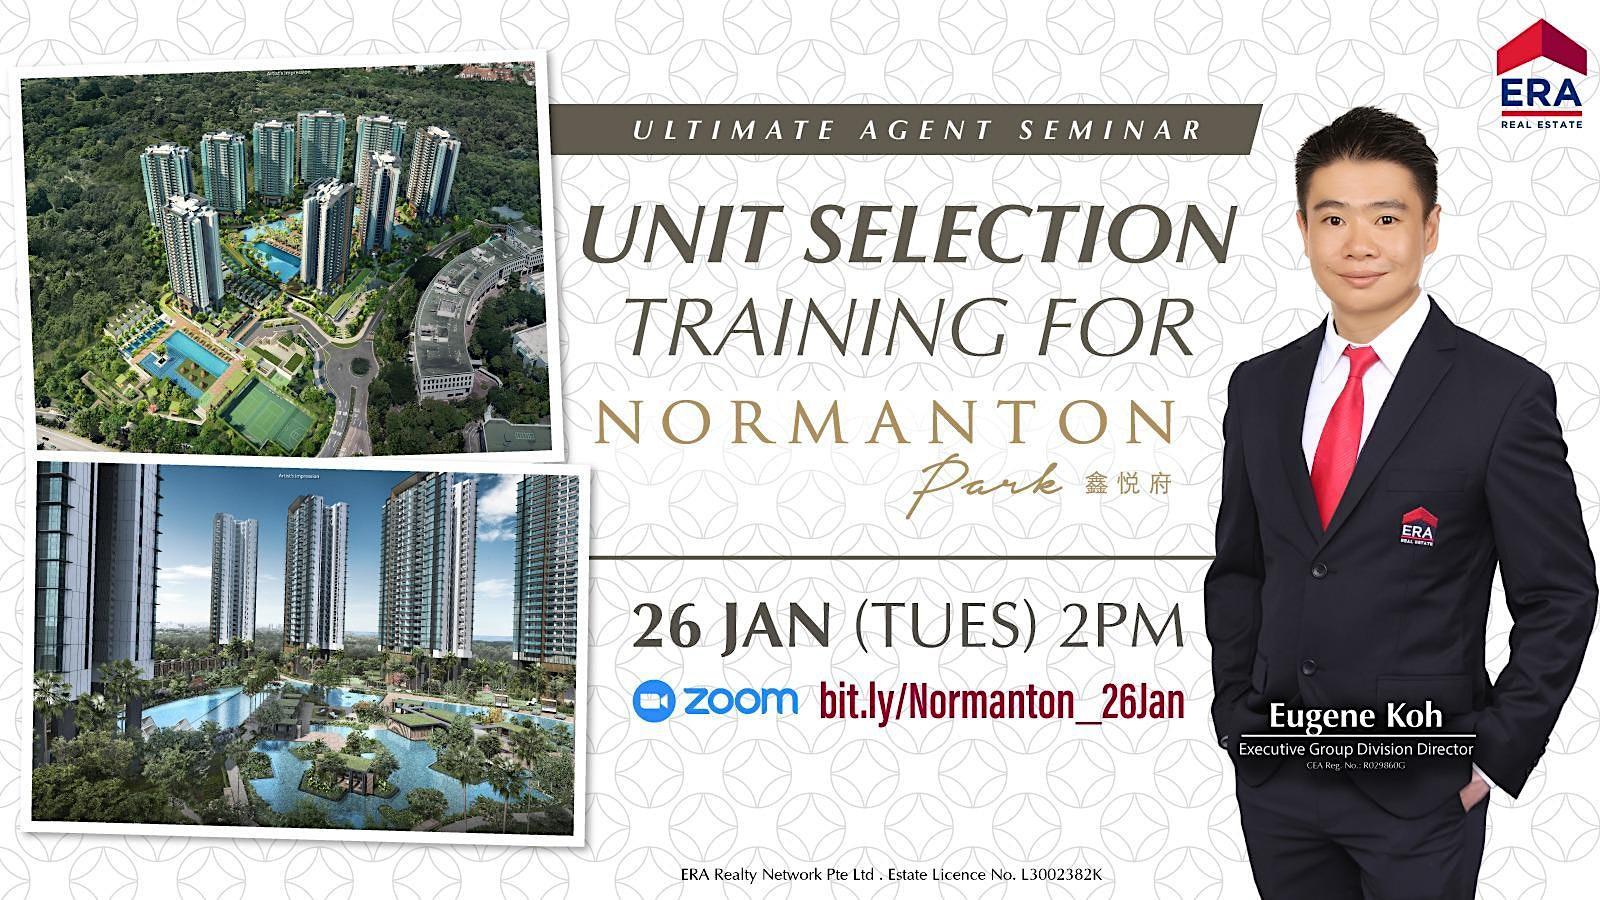 Unit Selection Training for Normanton Park